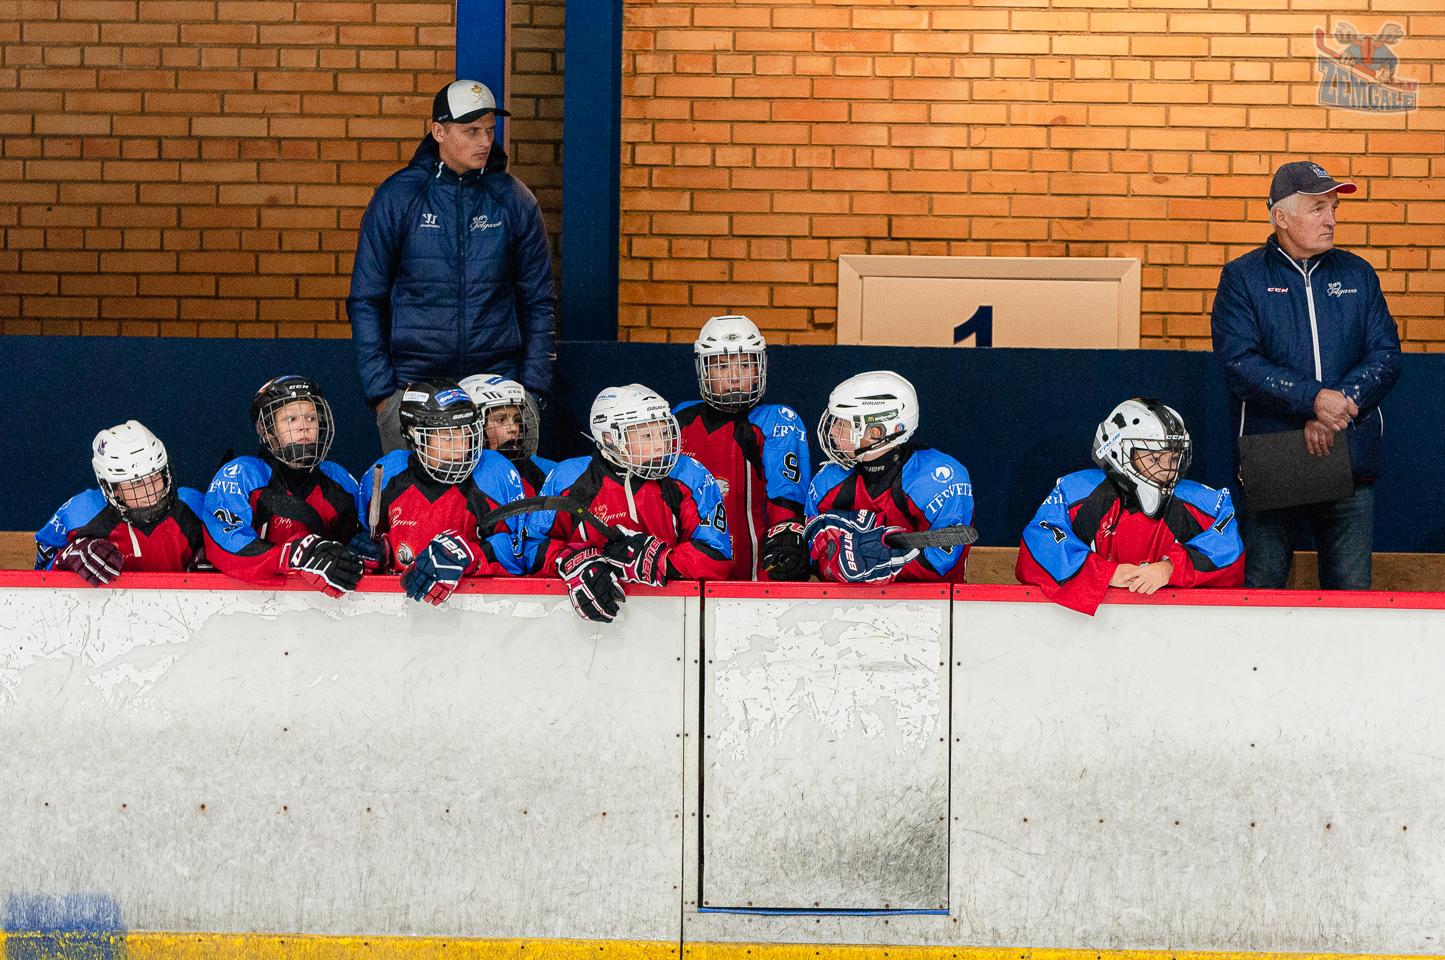 Hokeja skola JLSS U13 A - Mārupes HS 21092019-10